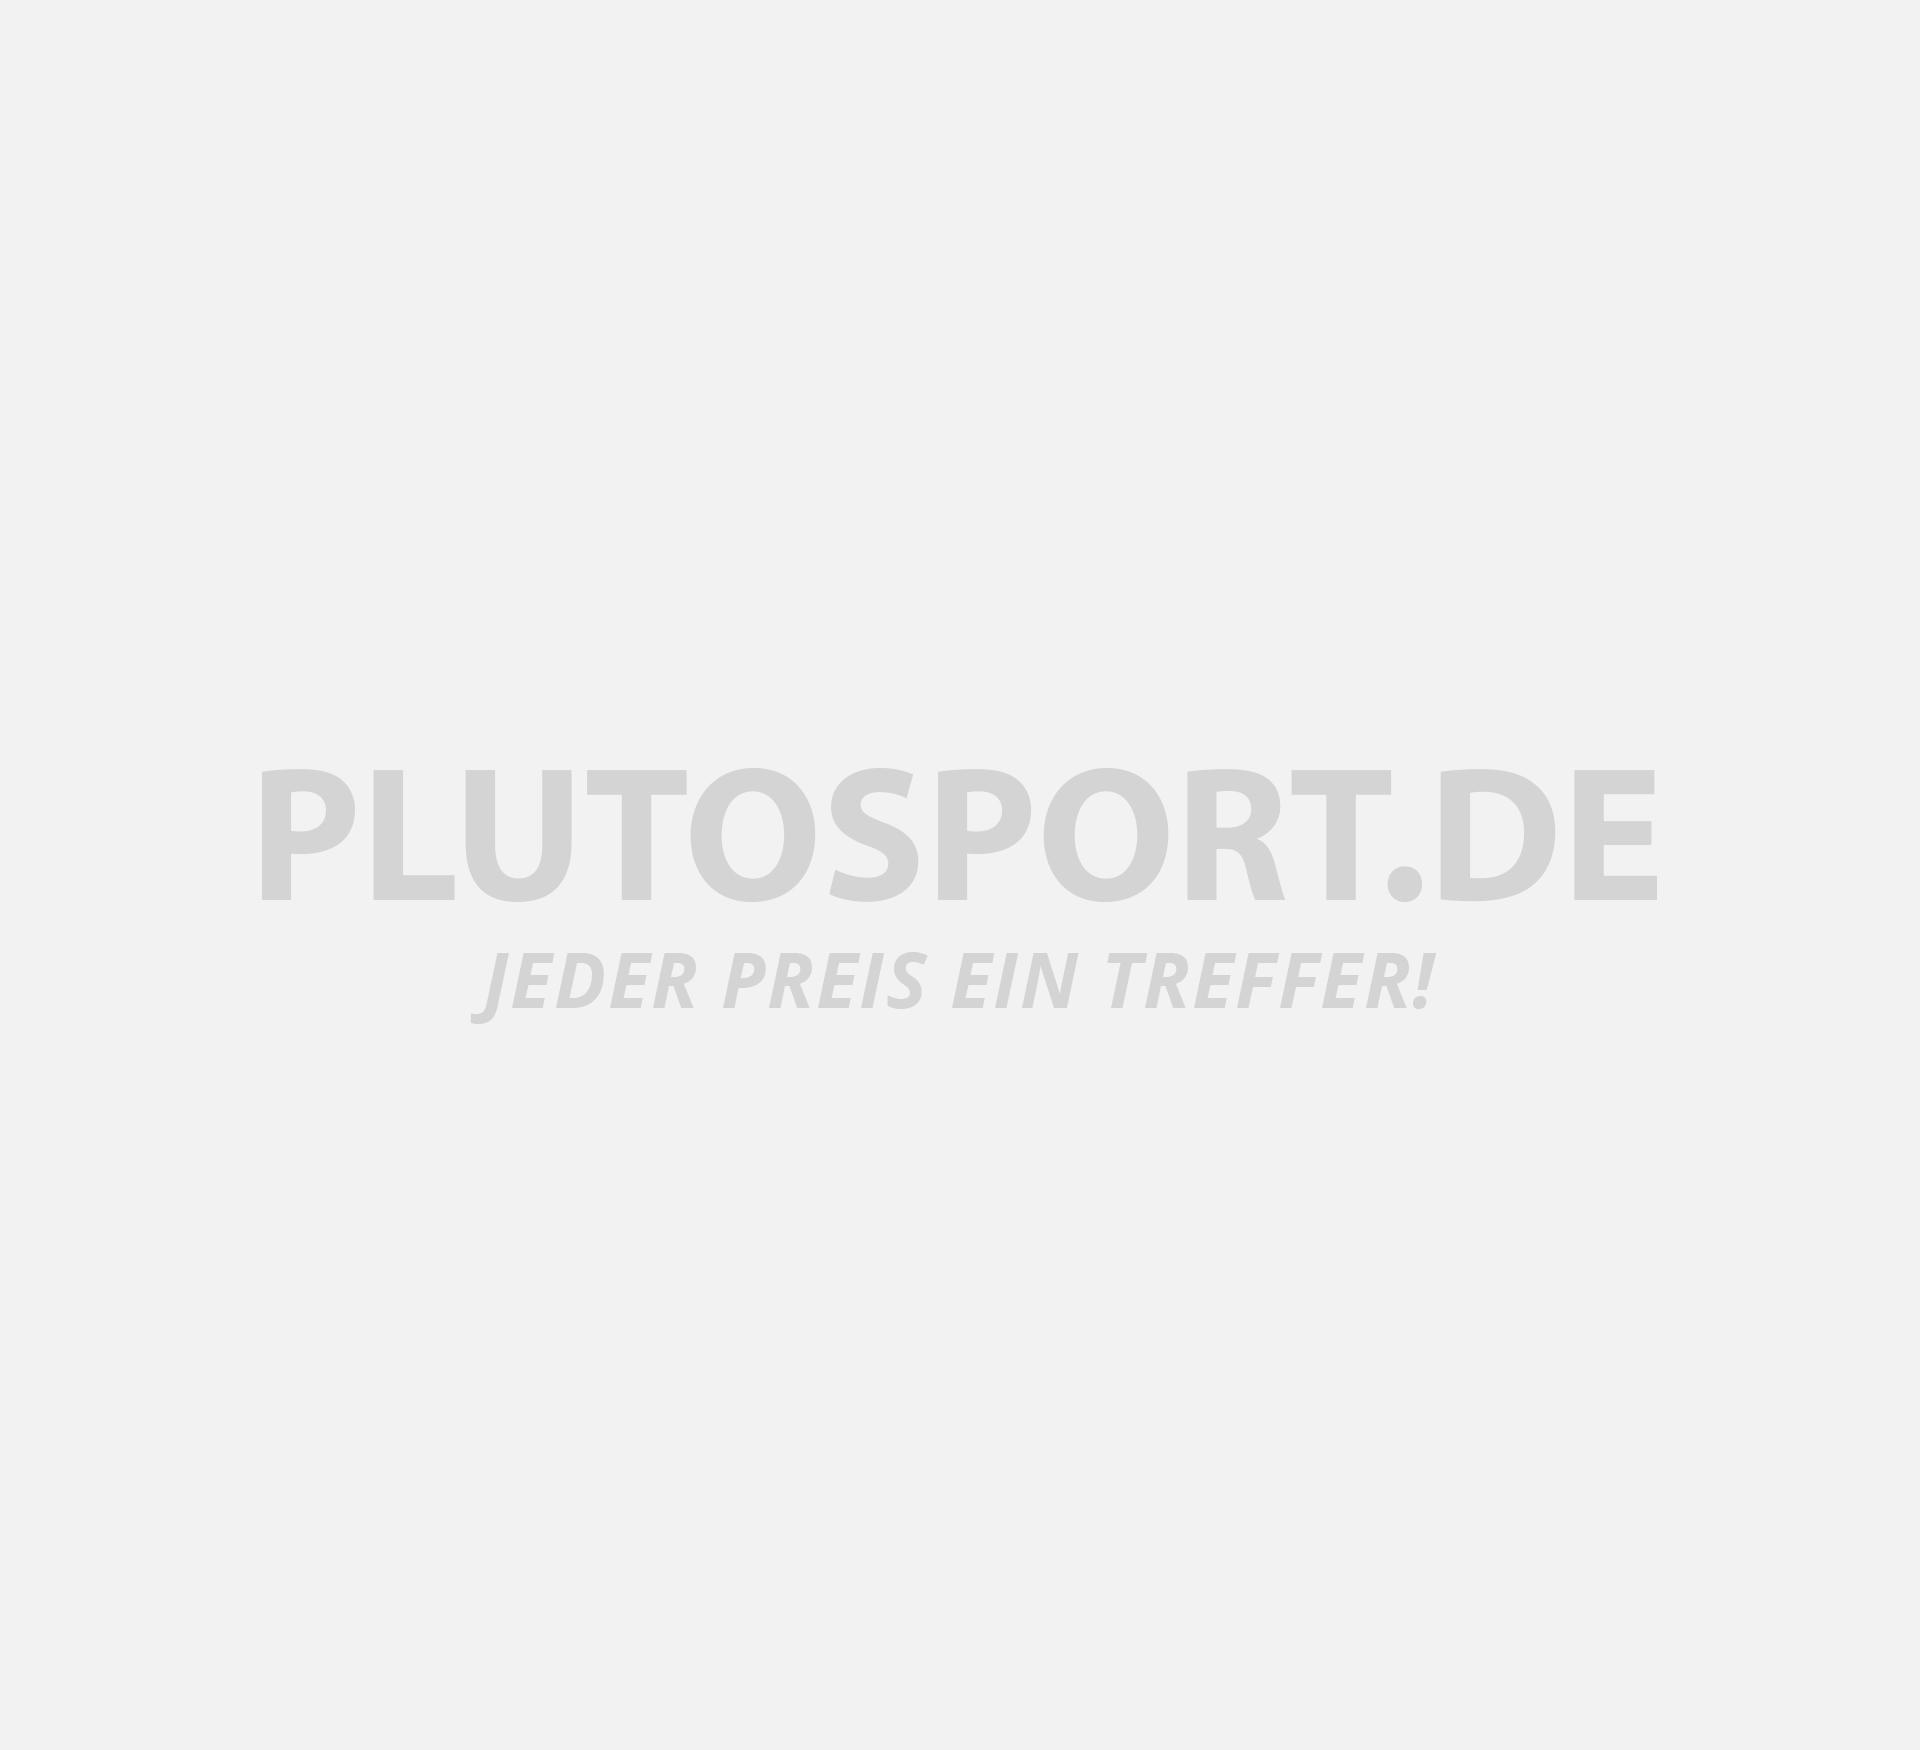 Adidas Telstar 18 World Cup Top Replique